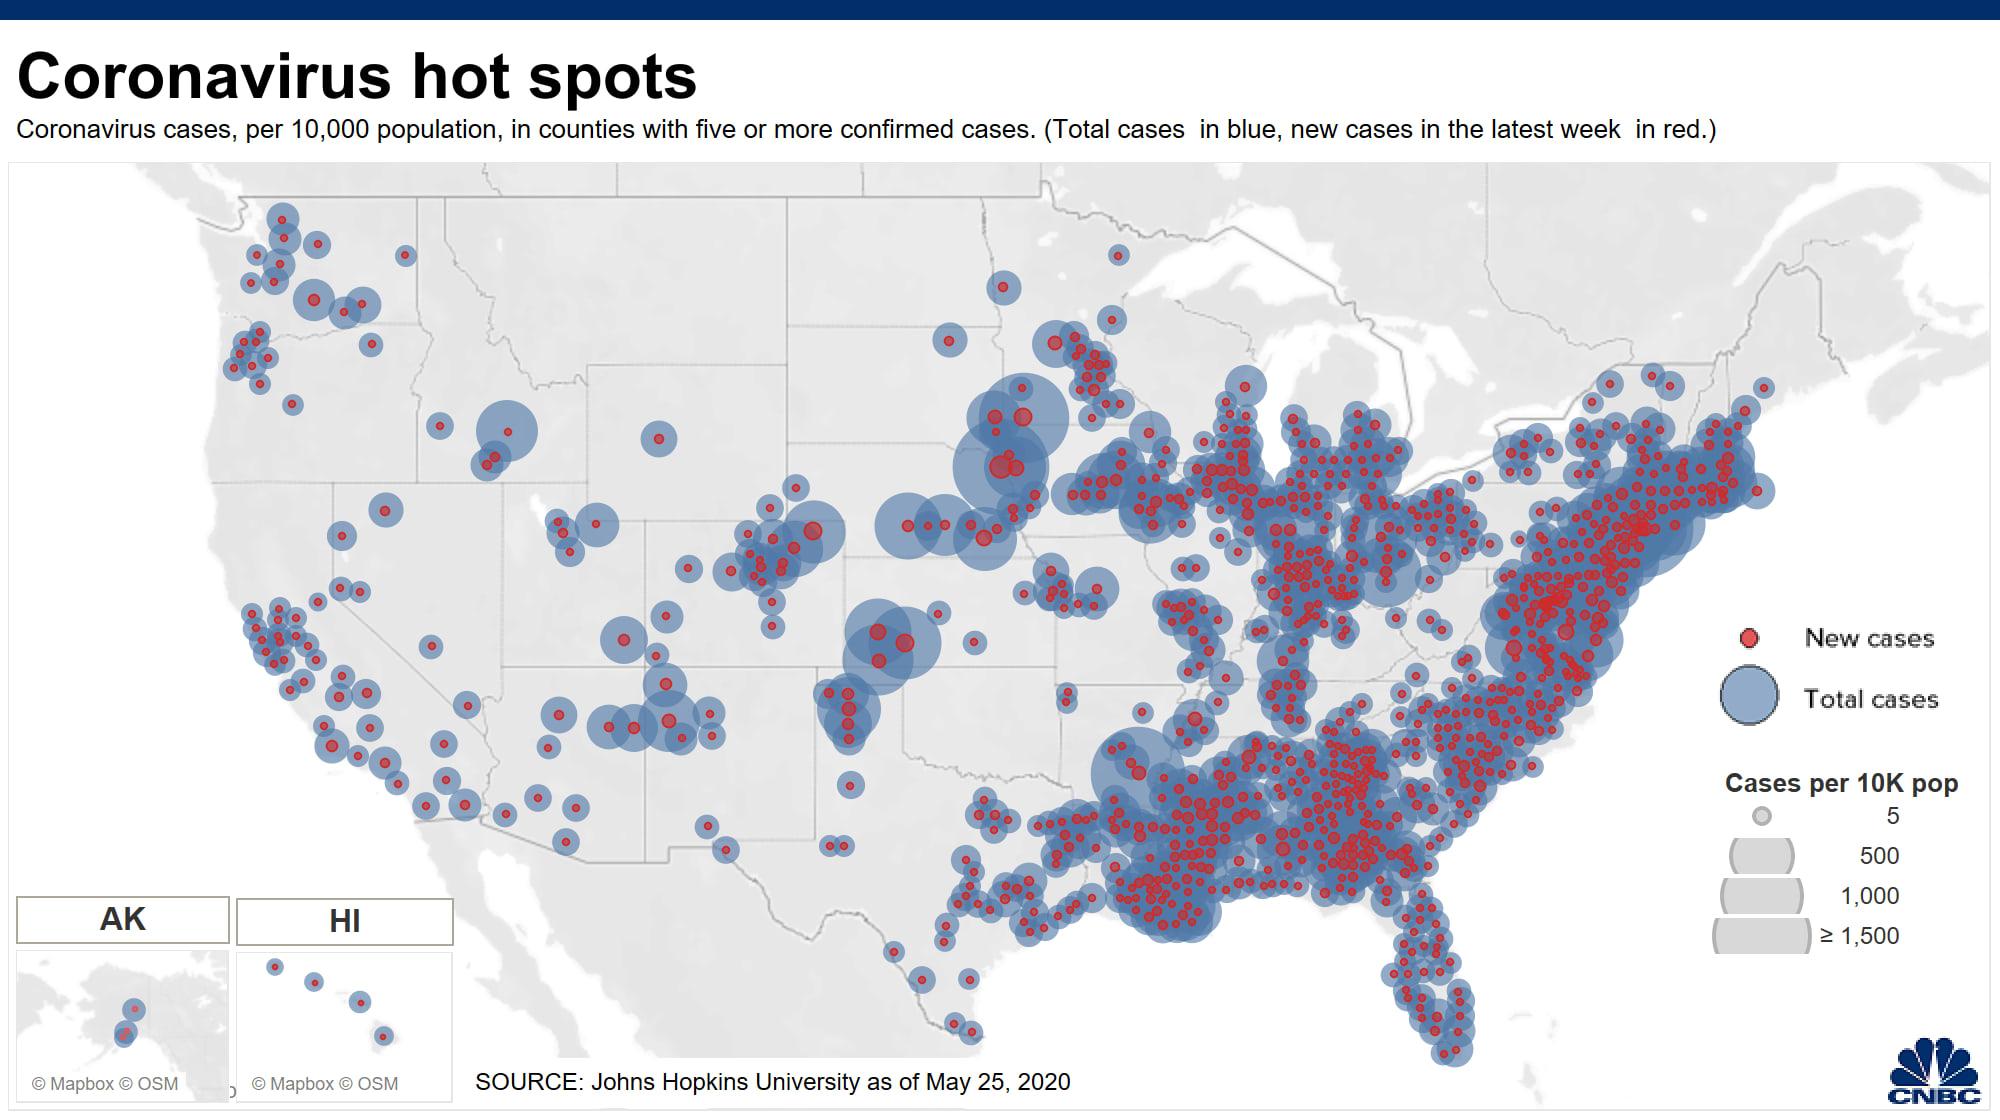 Confirmed coronavirus cases in the US pass 500,000: JHU